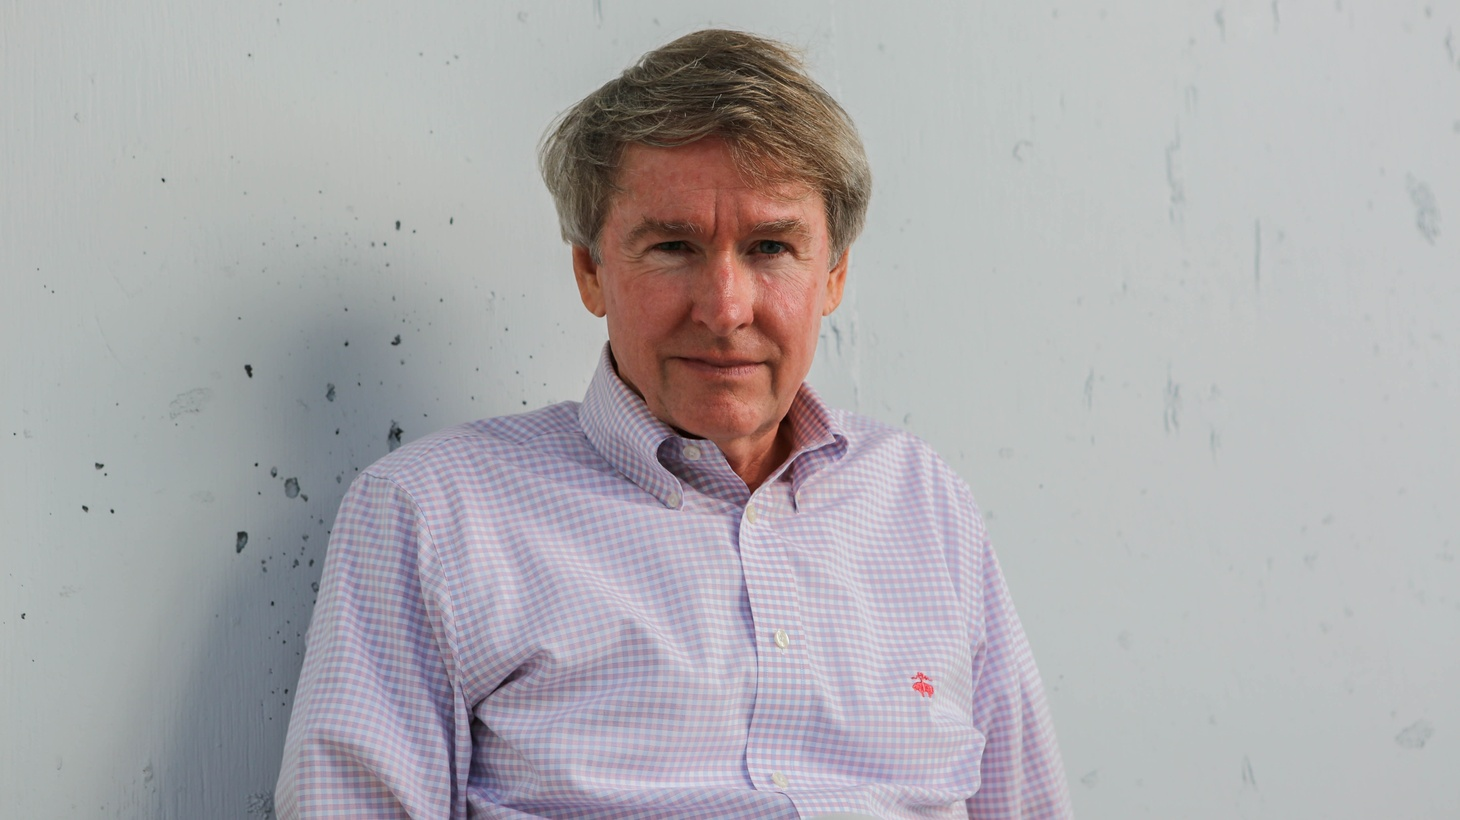 Author, Ben Fountain